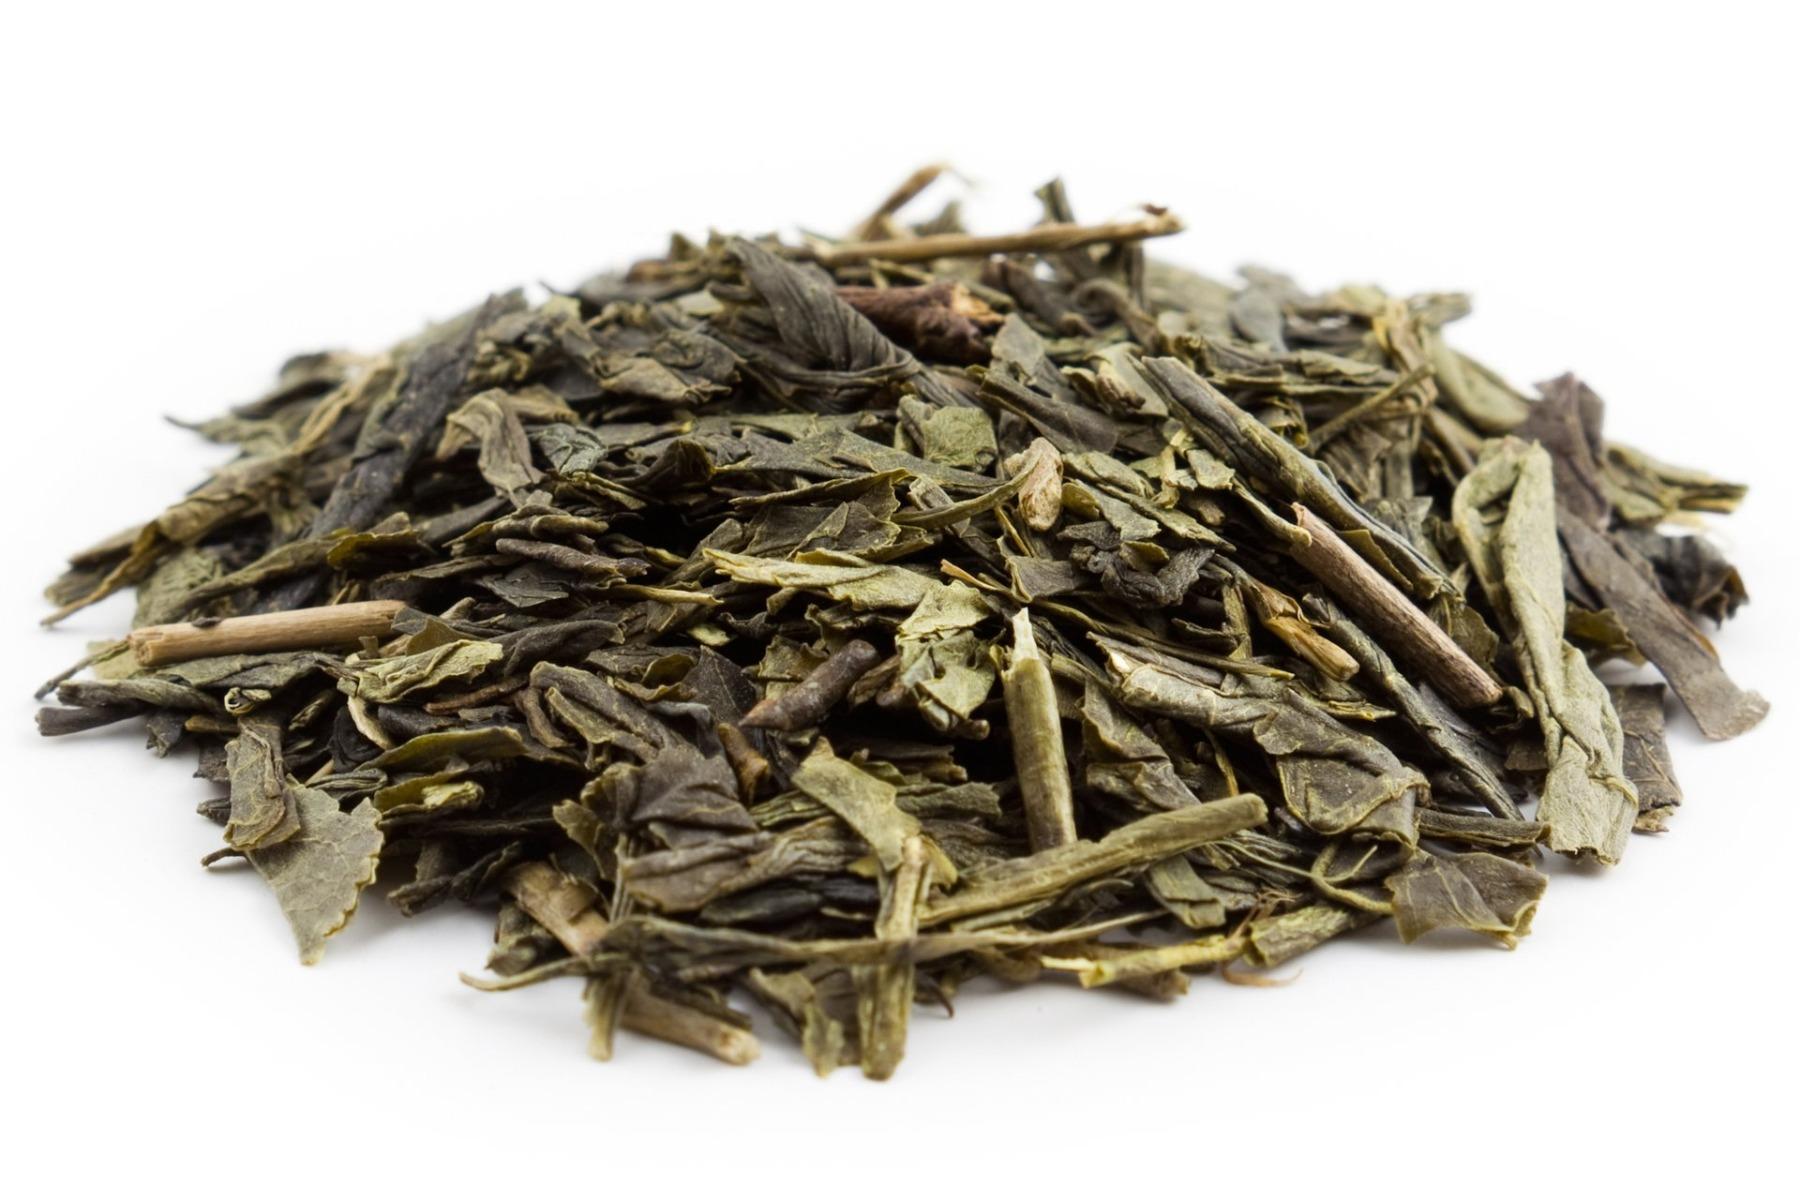 OS 41 | Зеленый чай Сенча Османтус 500 г | Coffee Shop